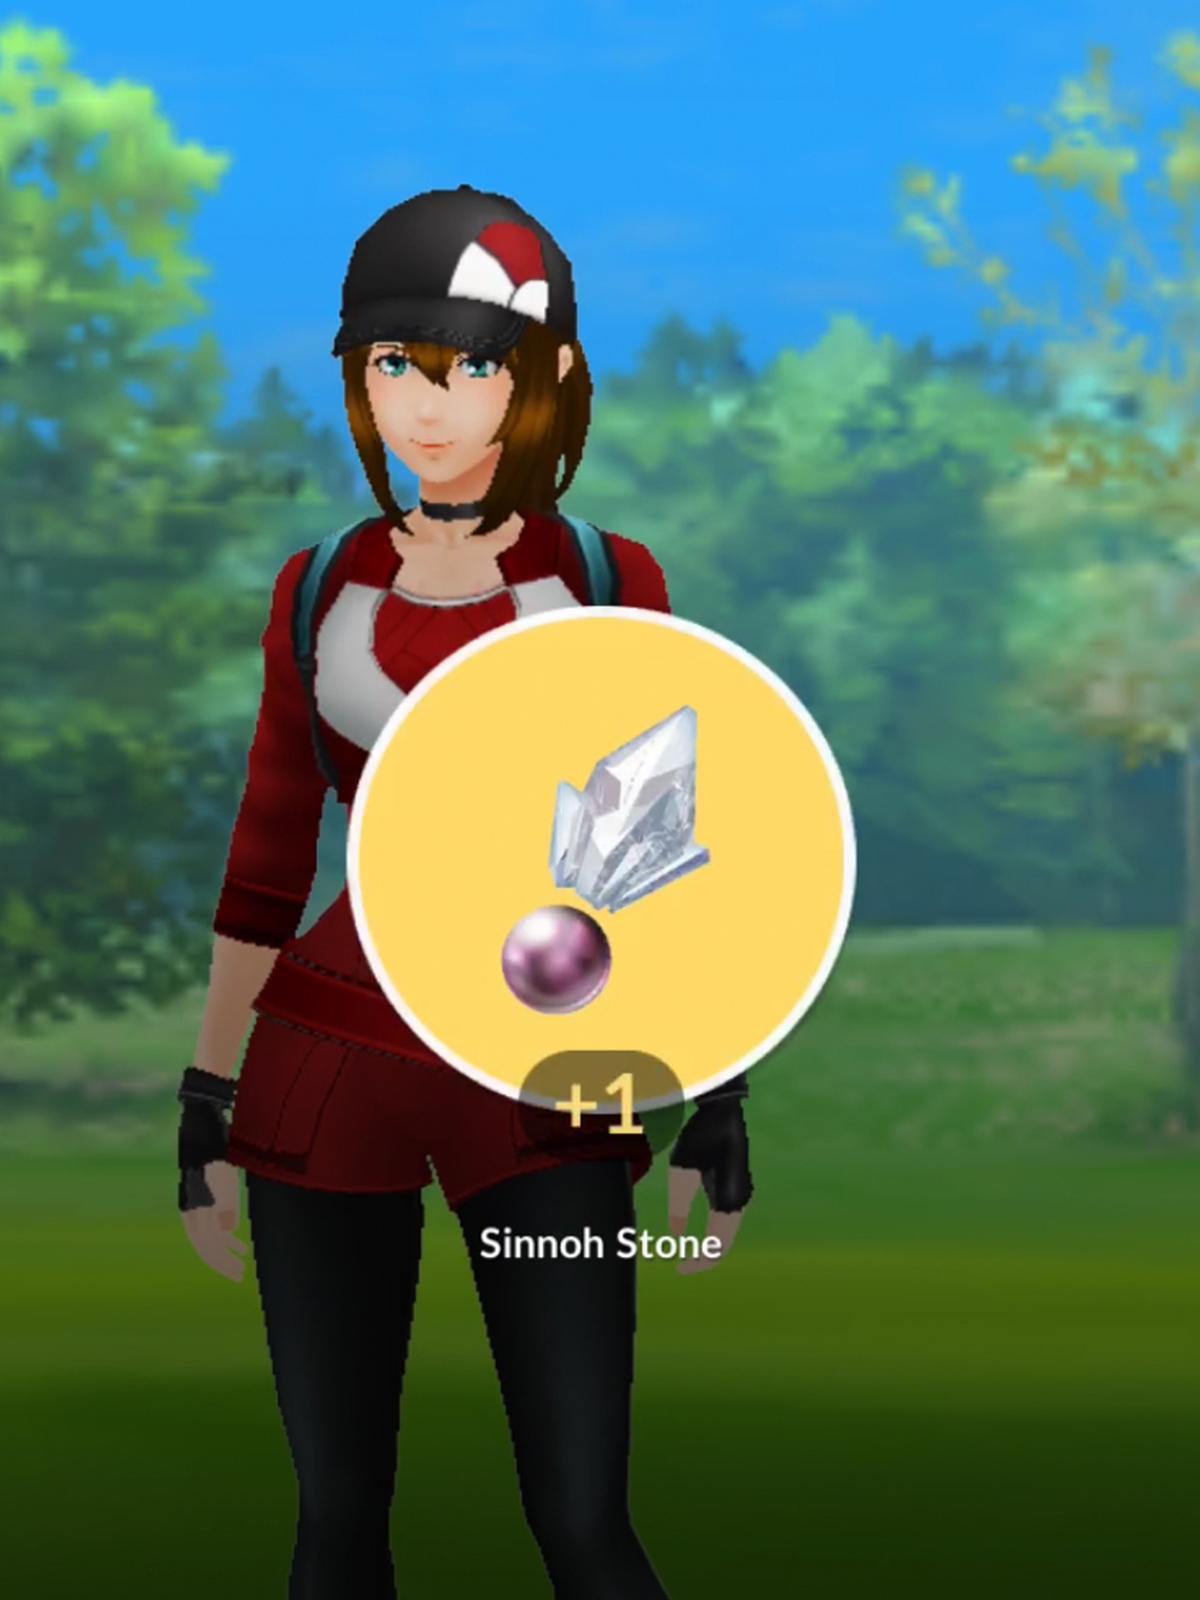 Pokémon GO APK 0 153 1 Download, the best real world